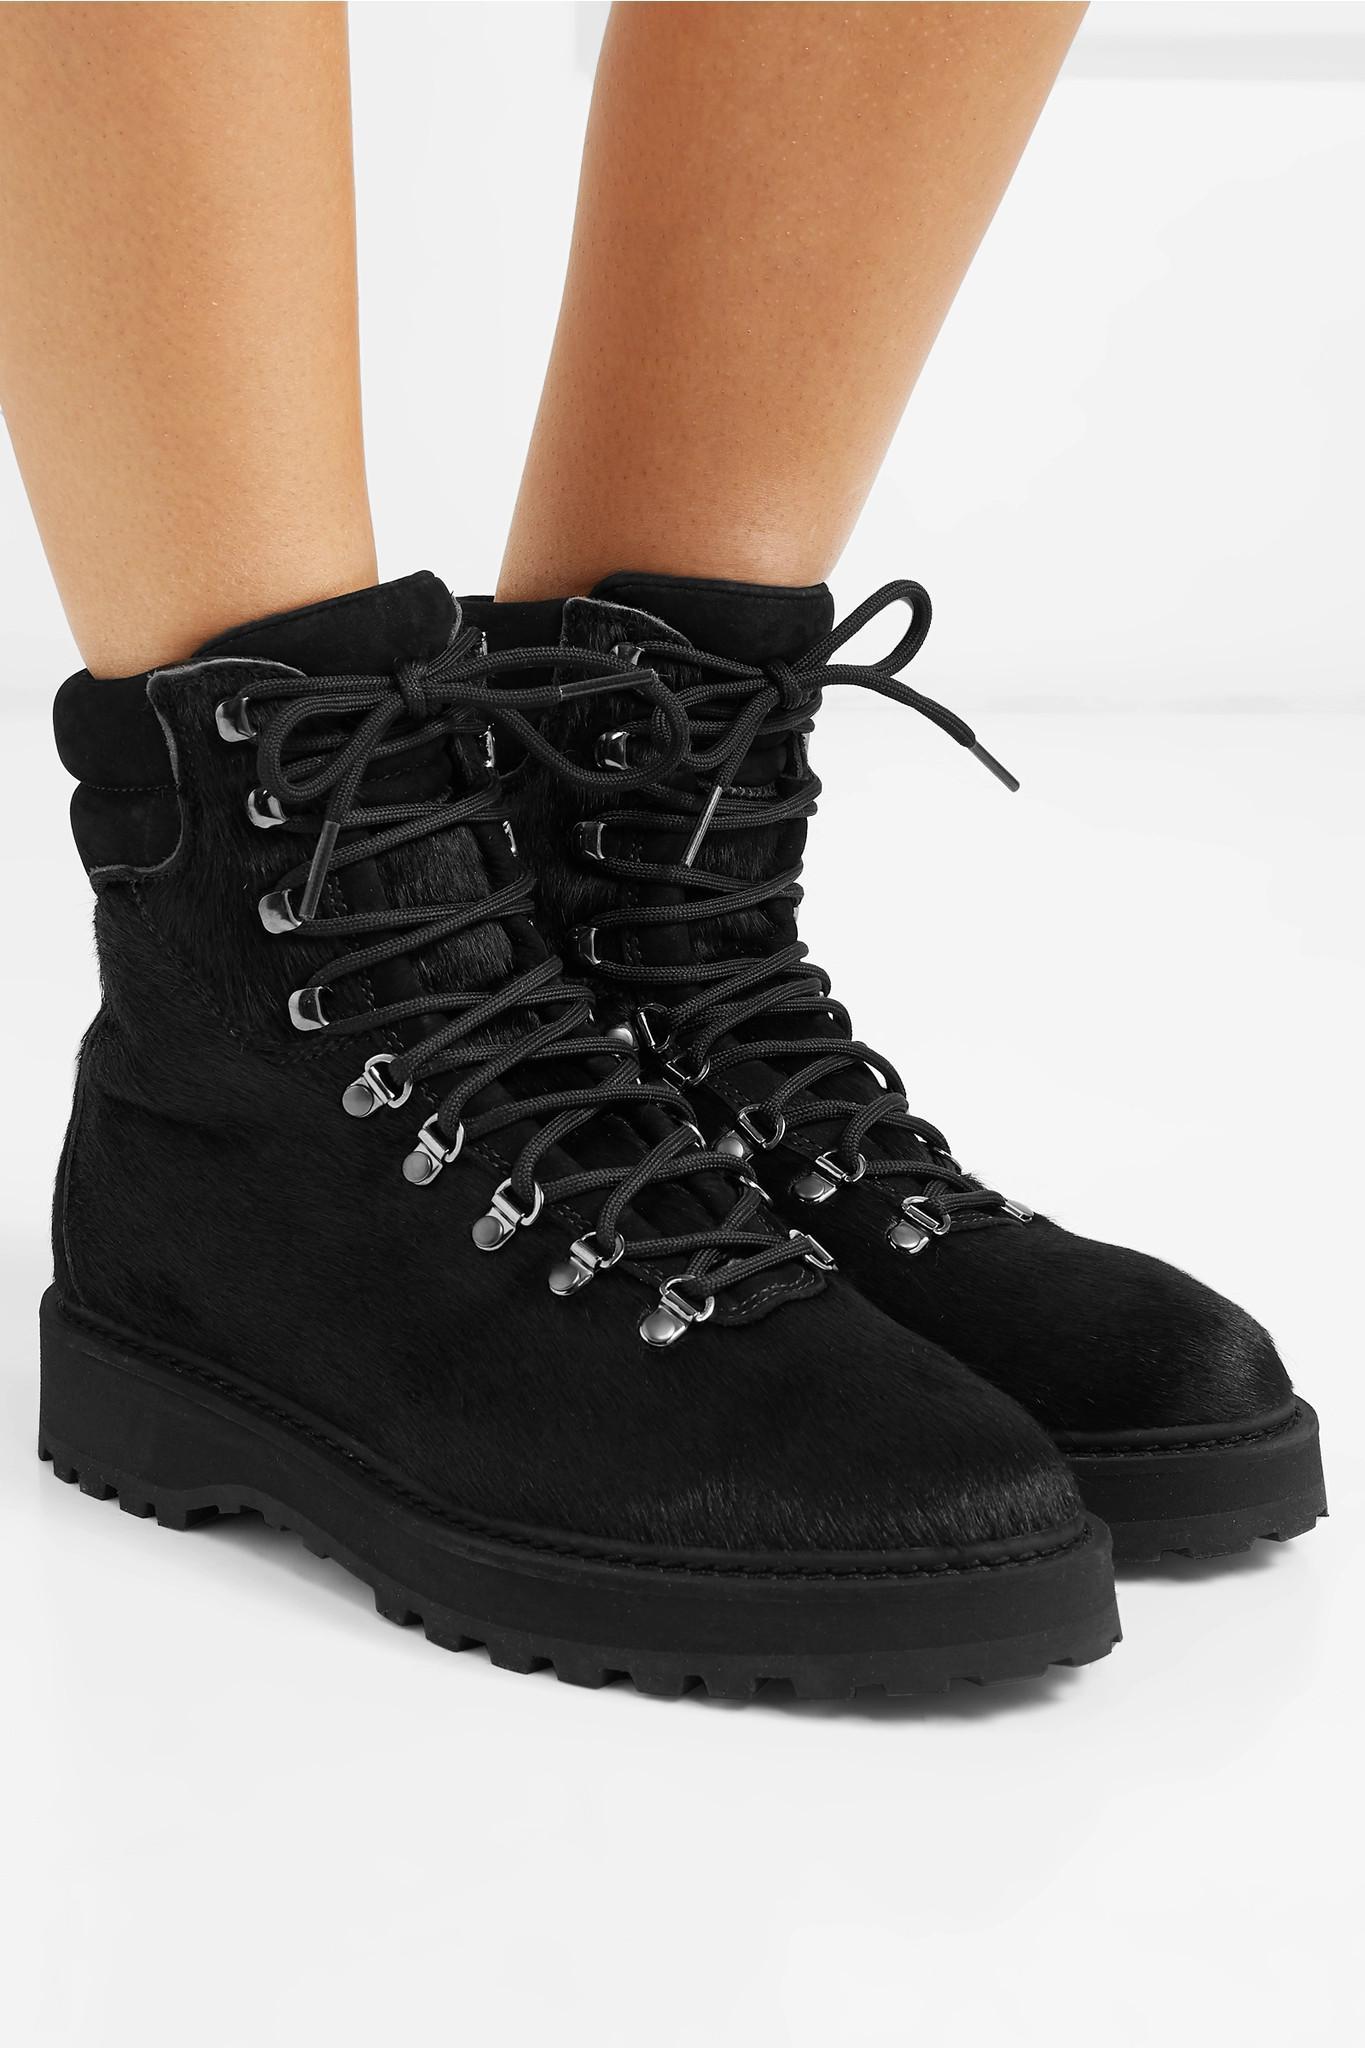 387d852687c Diemme Monfumo Calf Hair Ankle Boots in Black - Lyst